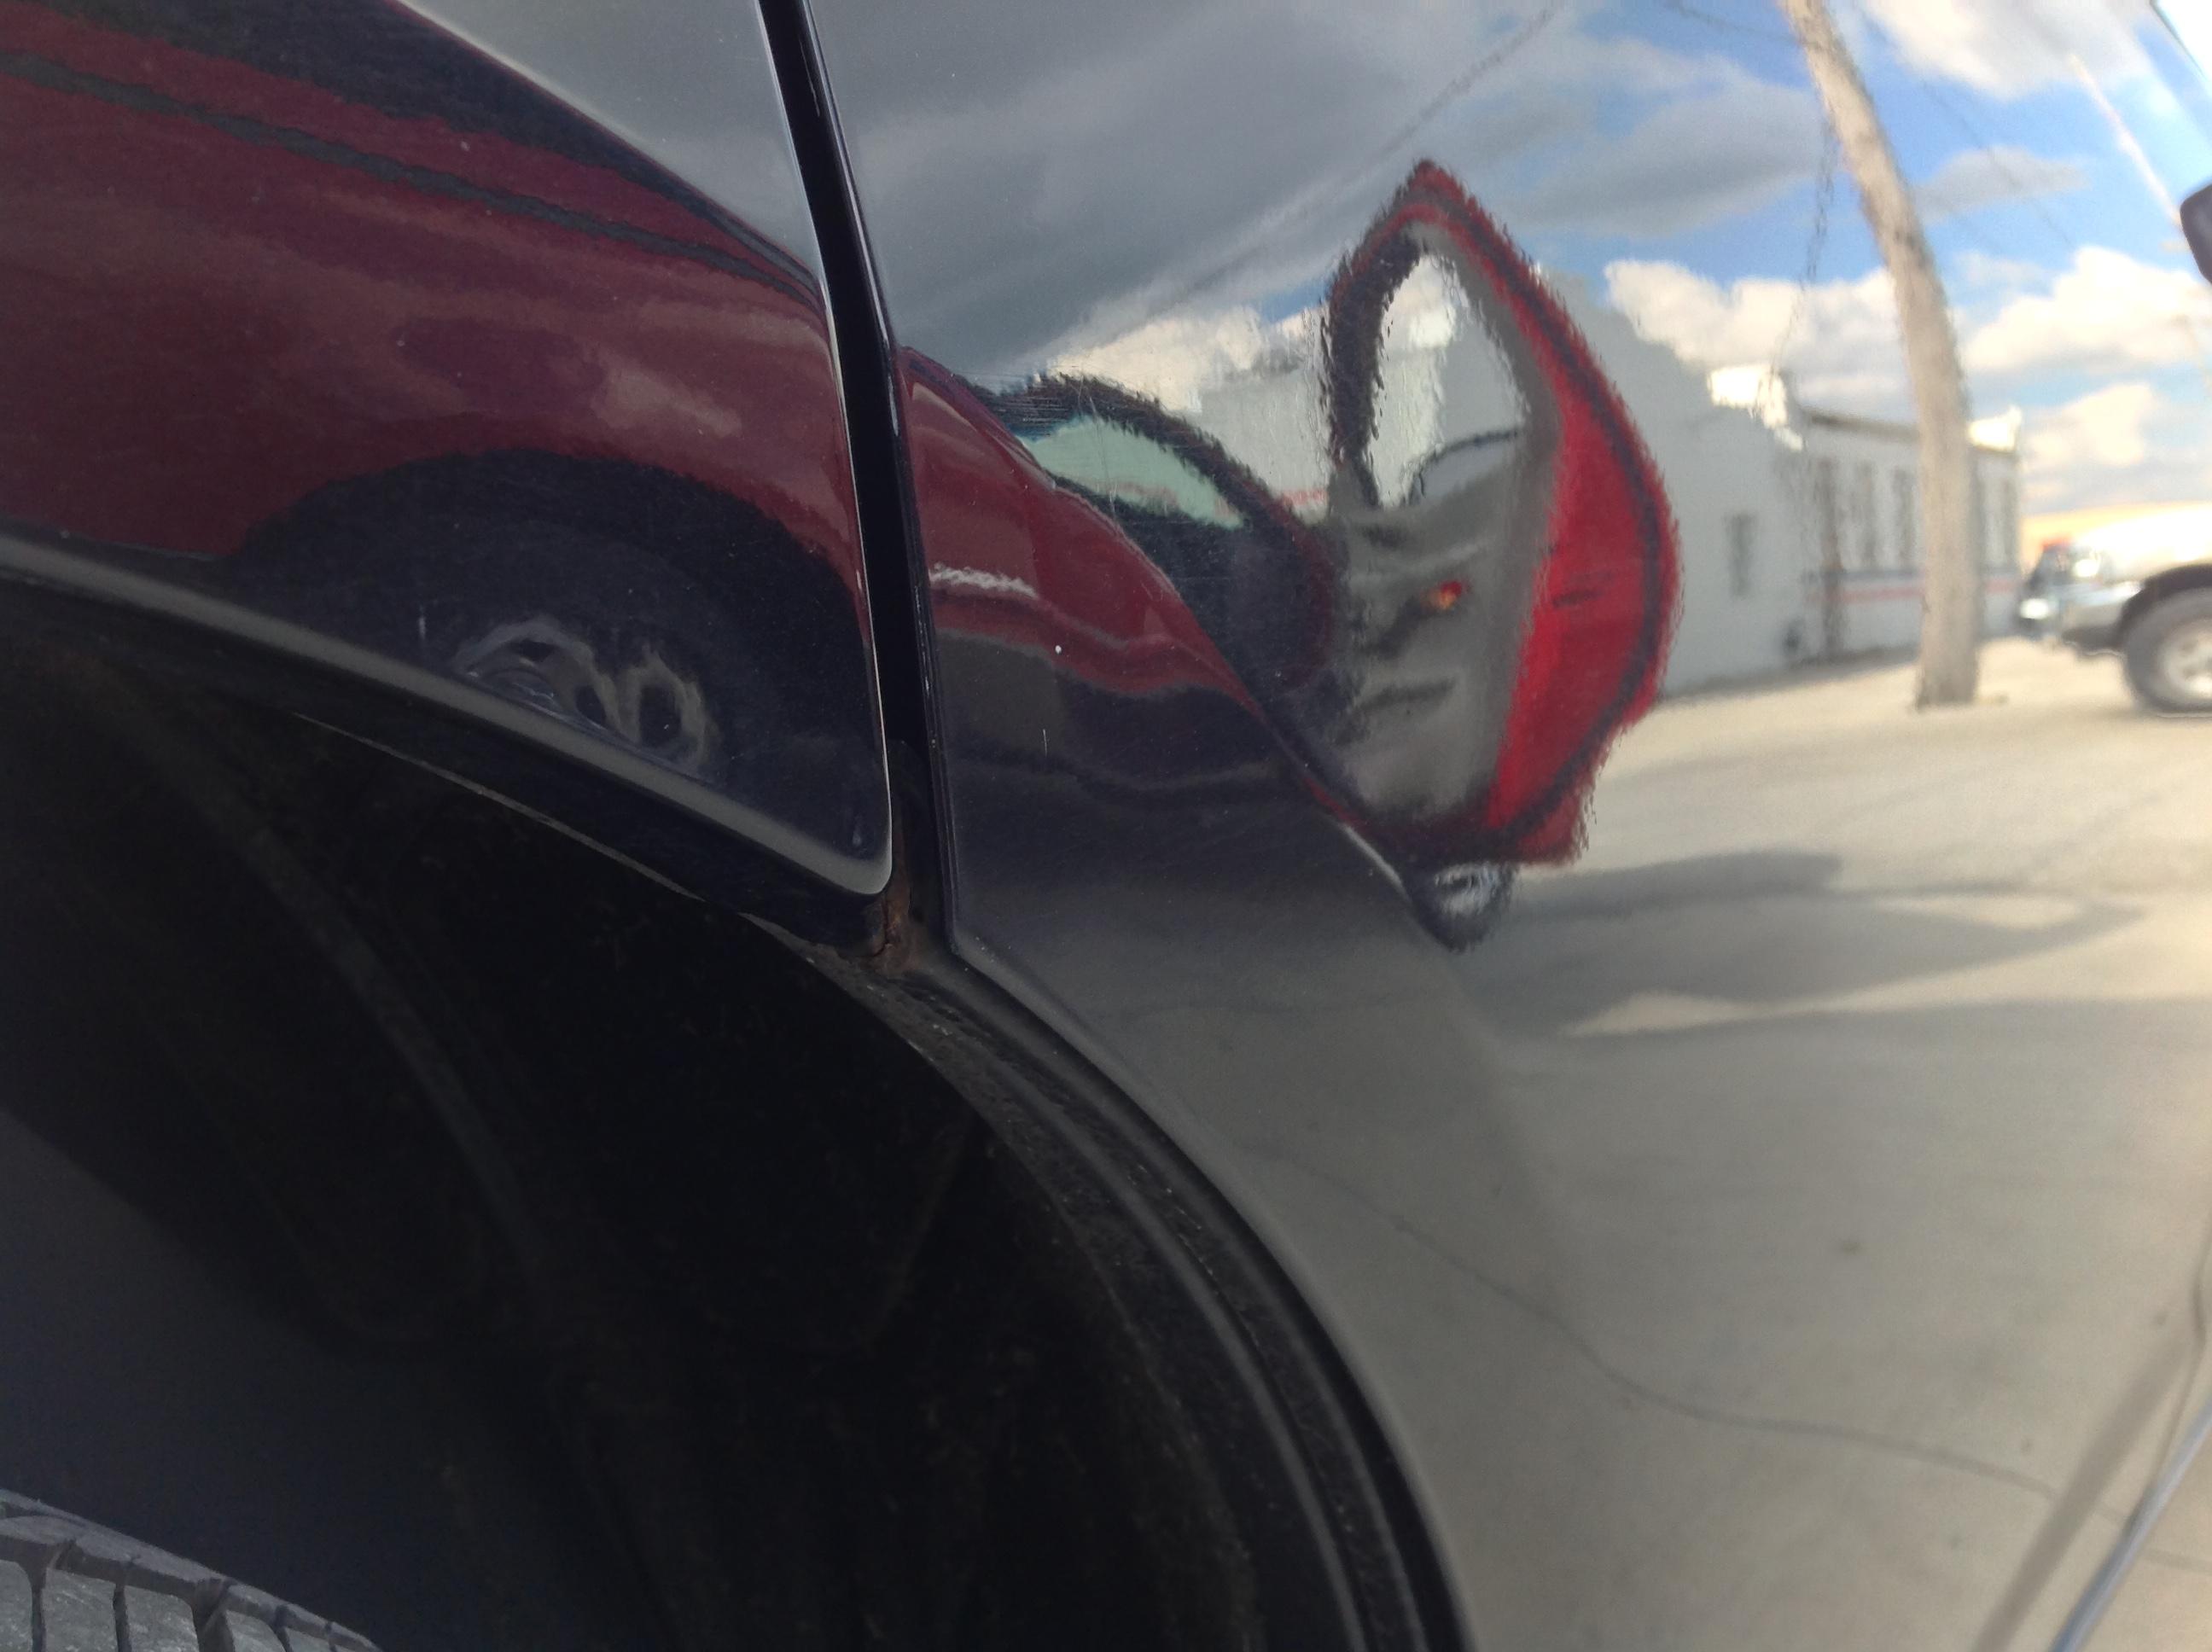 2011 Dodge Charger Passenger Rear Door Dent Removal, Springfield IL, Taylorville IL, Decatur IL, Mobile Dent Repair http://217dent.com